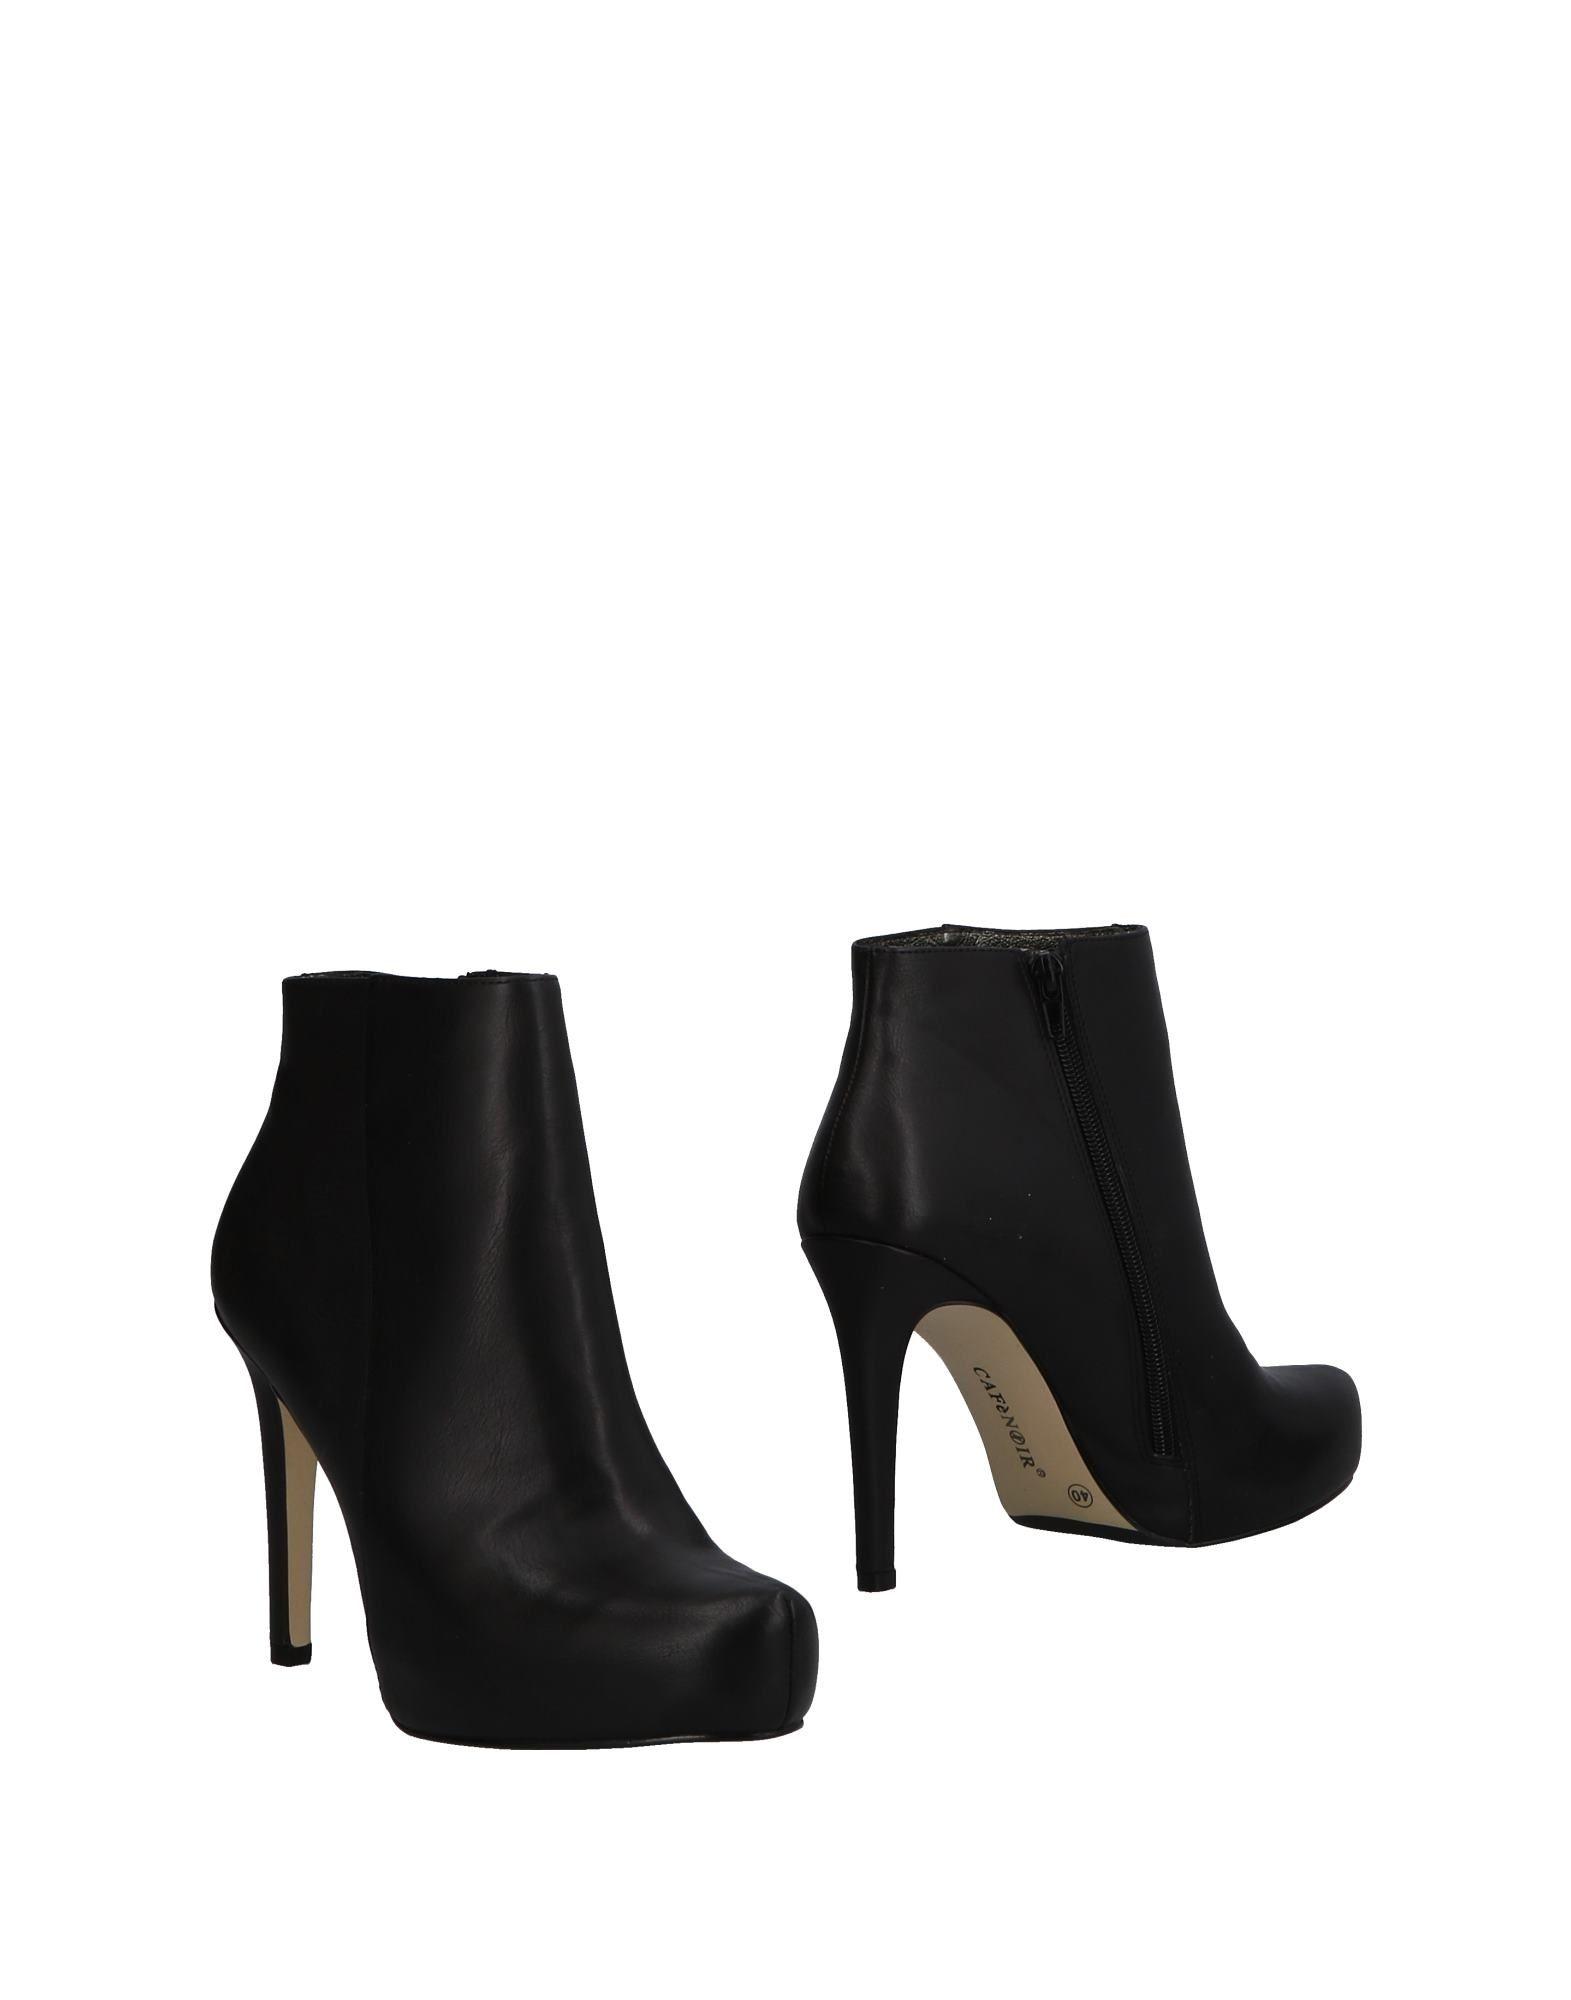 Cafènoir Stiefelette Damen  11491708PL Gute Qualität beliebte Schuhe